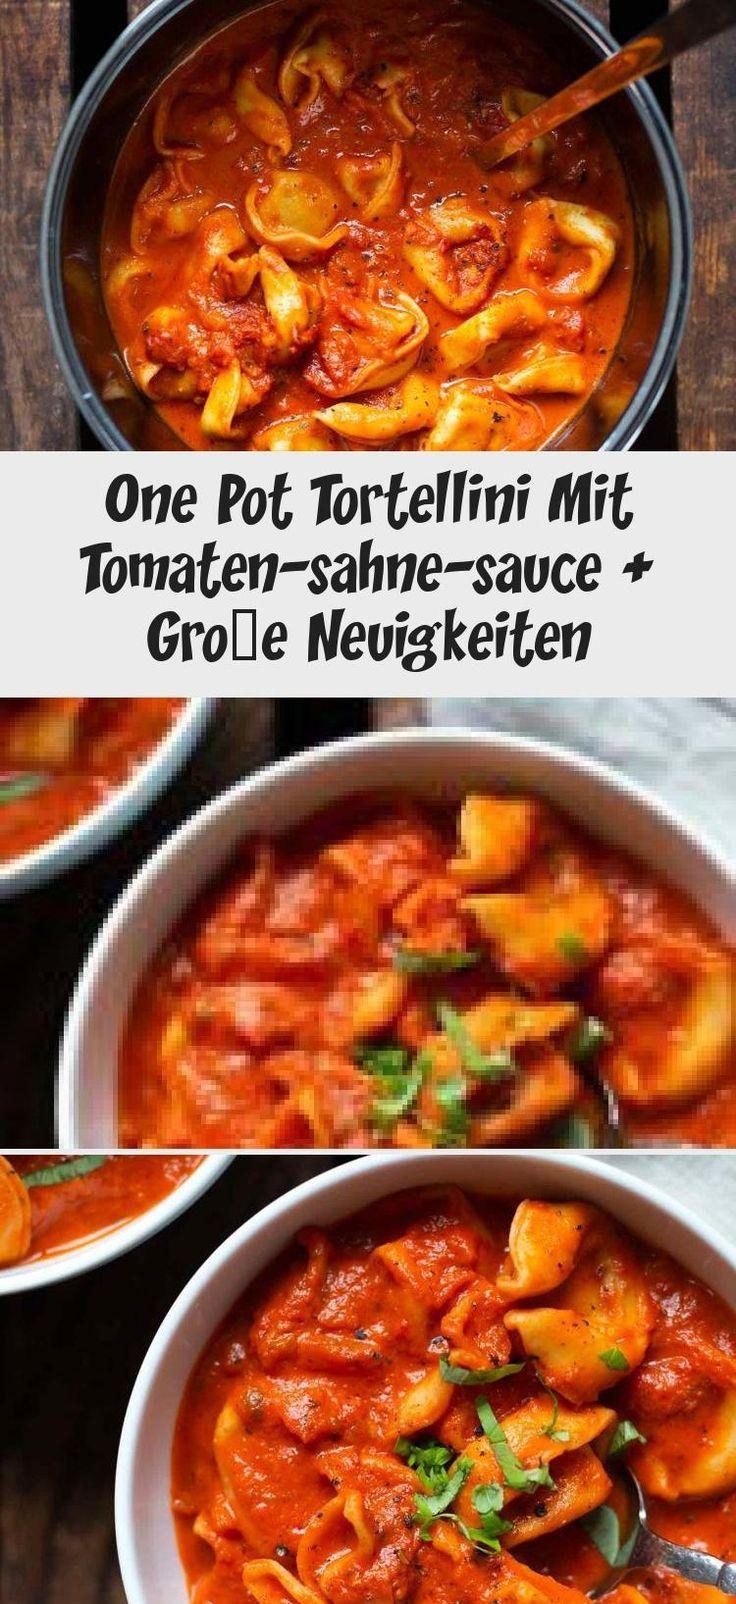 One Pot Tortellini With Tomato Cream Sauce + Big News #tomatocreamsauces